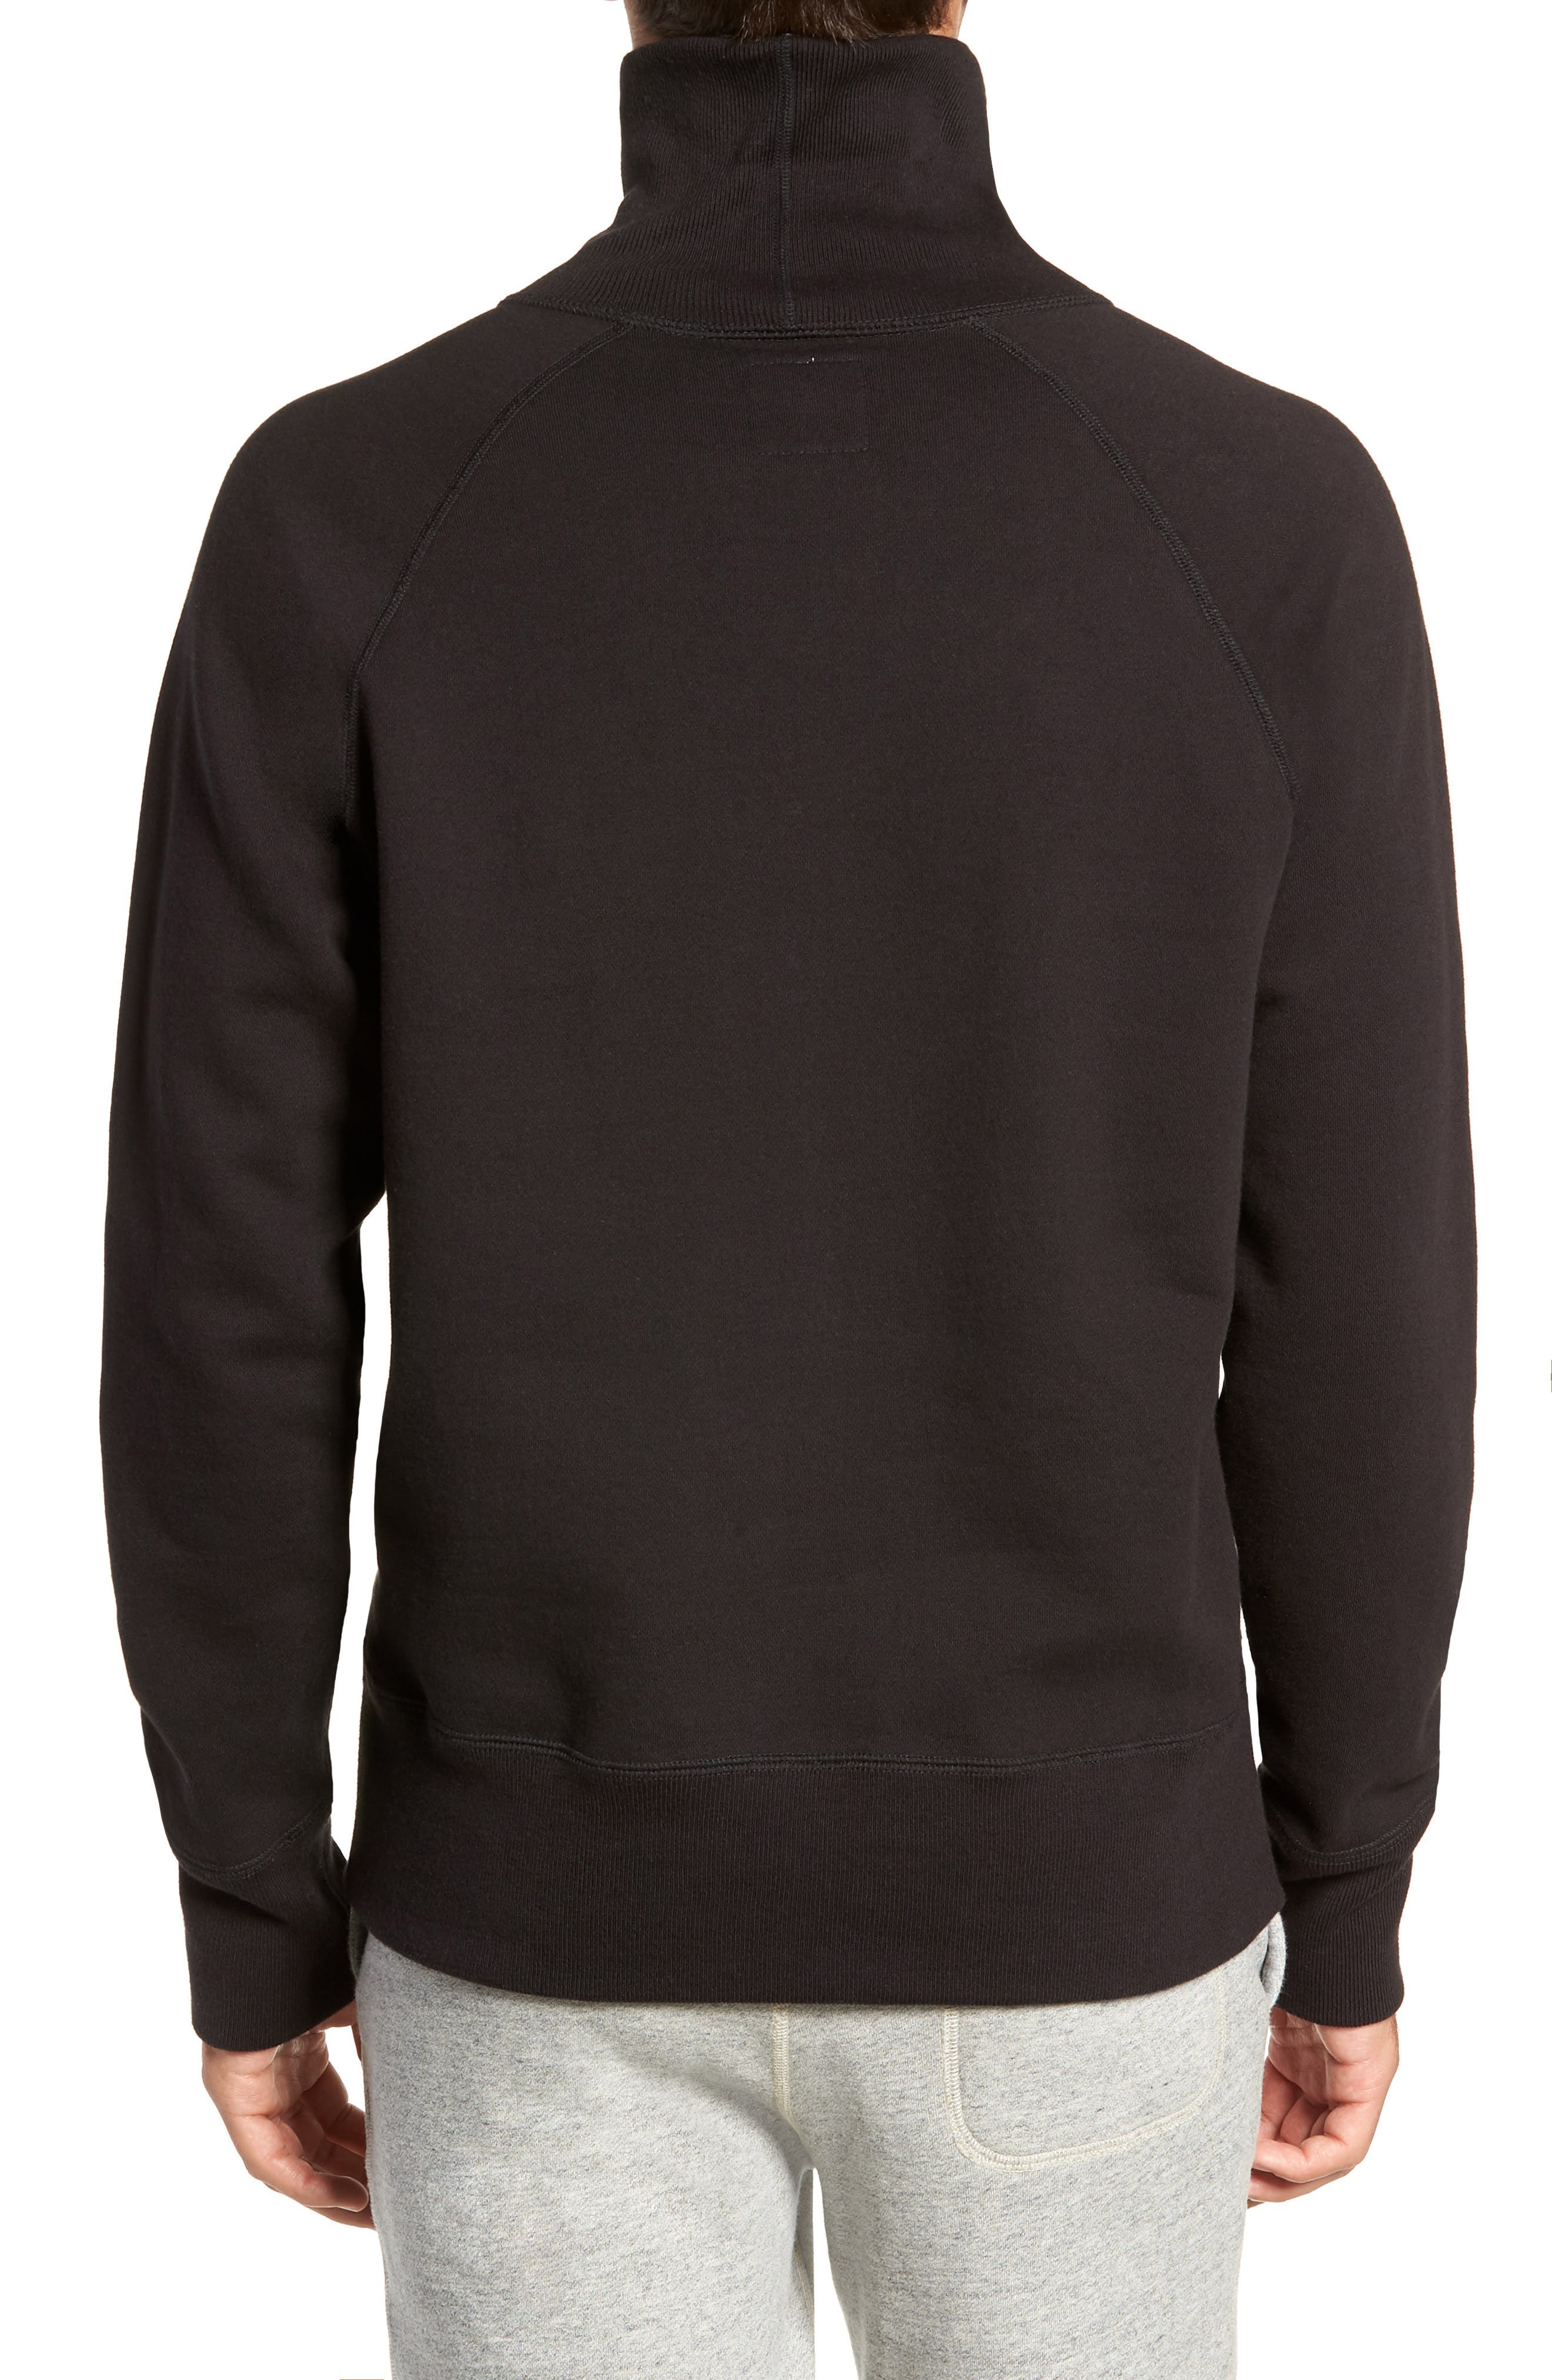 + Champion Turtleneck Sweatshirt,                             Alternate thumbnail 2, color,                             001